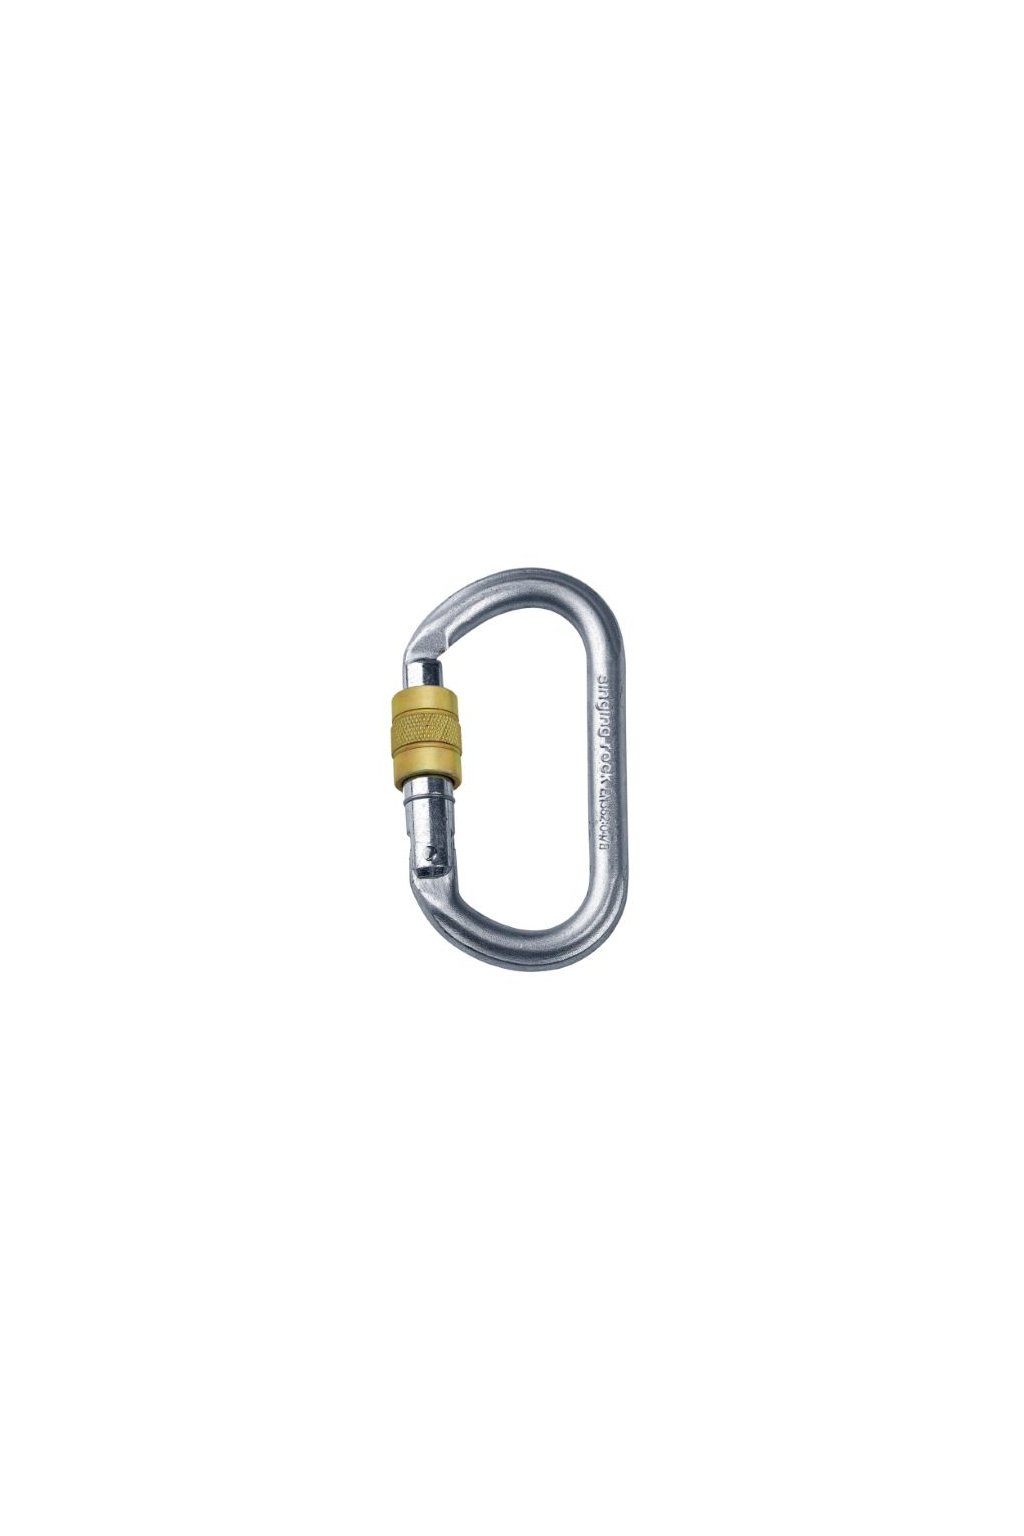 CA Oval steel screw